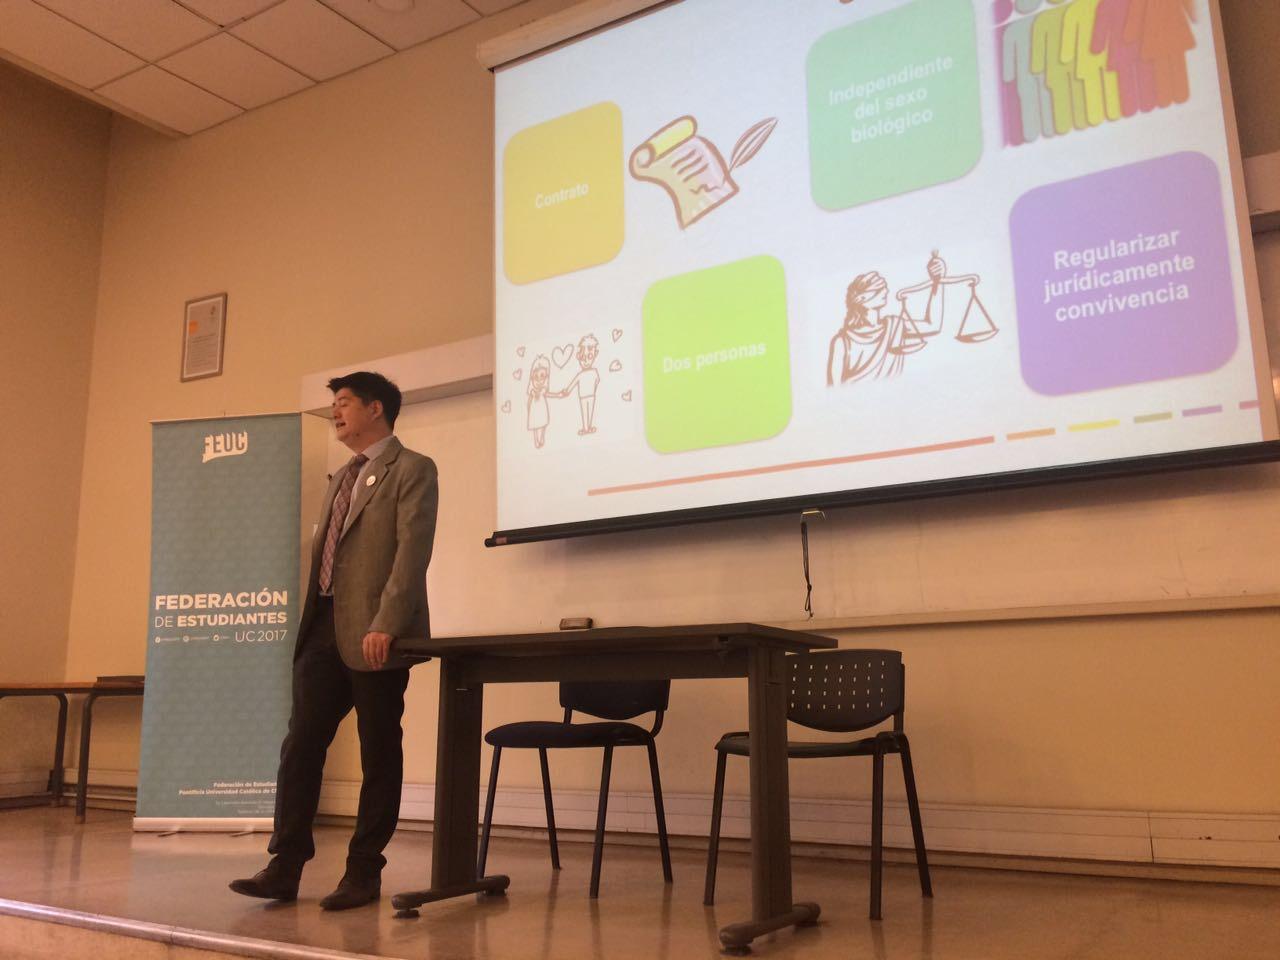 Matrimonio Universidad Catolica : Iguales realiza charla sobre matrimonio igualitario en